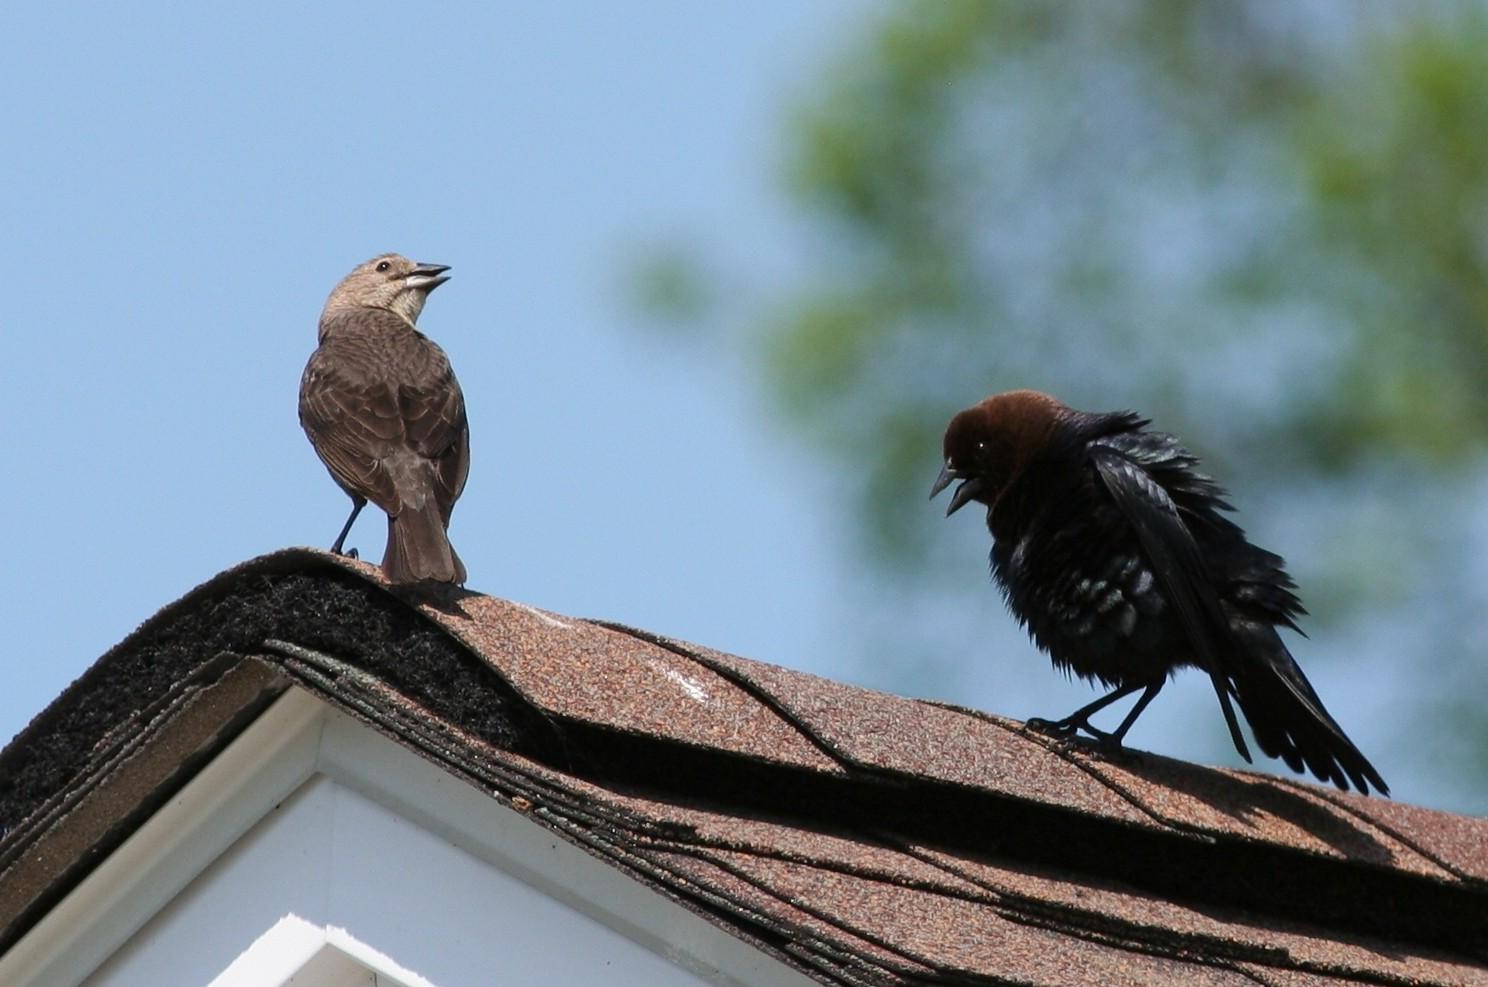 cowbirds in courtship - how to get rid of cowbirds